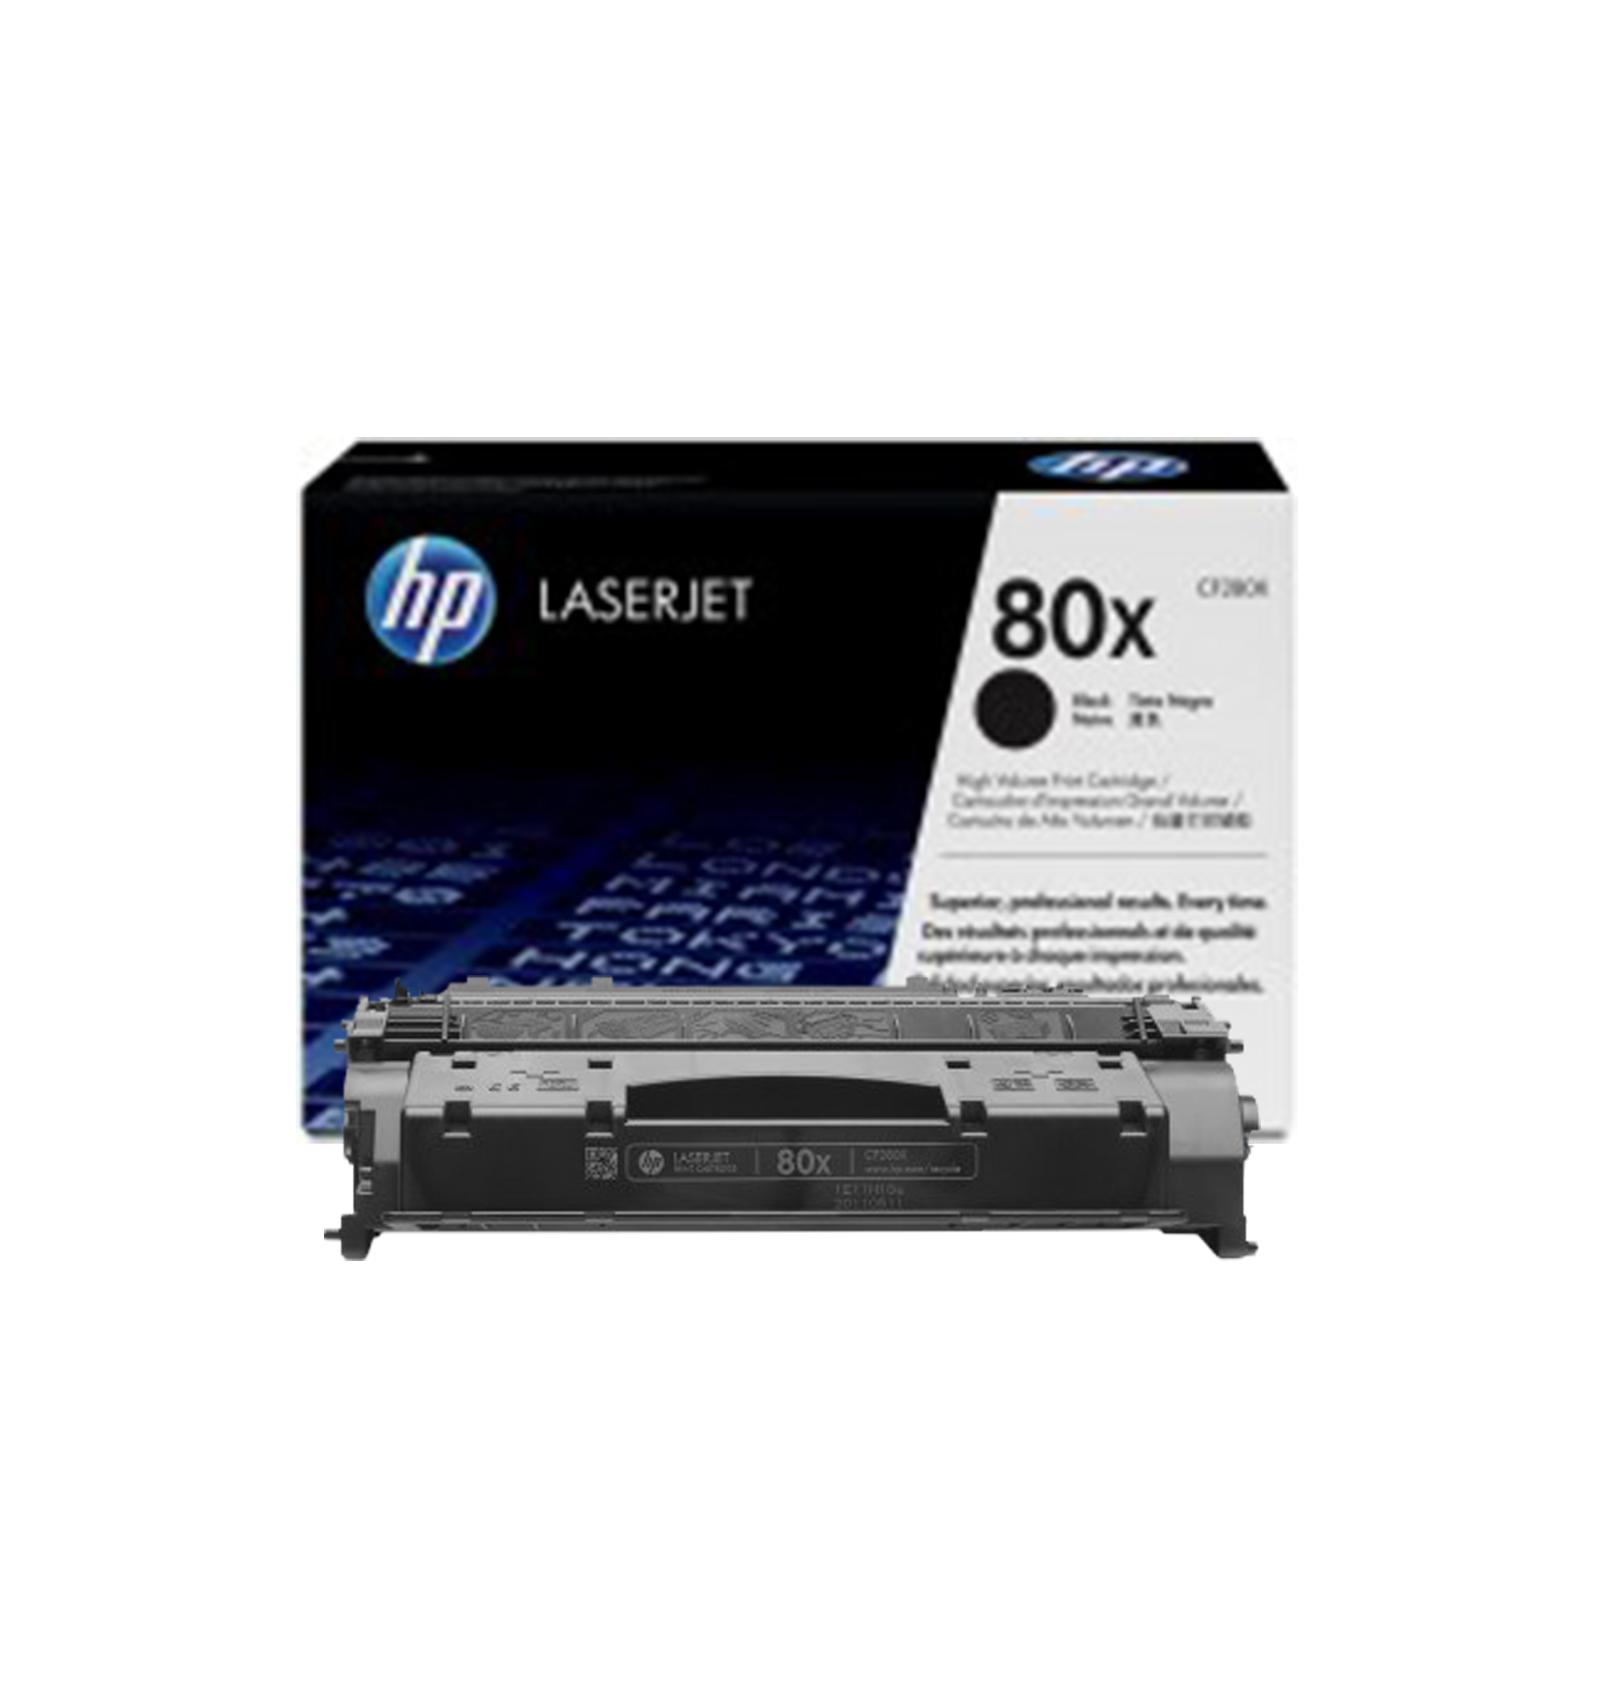 HP CF280X (80X) для LaserJet Pro 400 M401a/M401d/M401dn/M401dw/M425